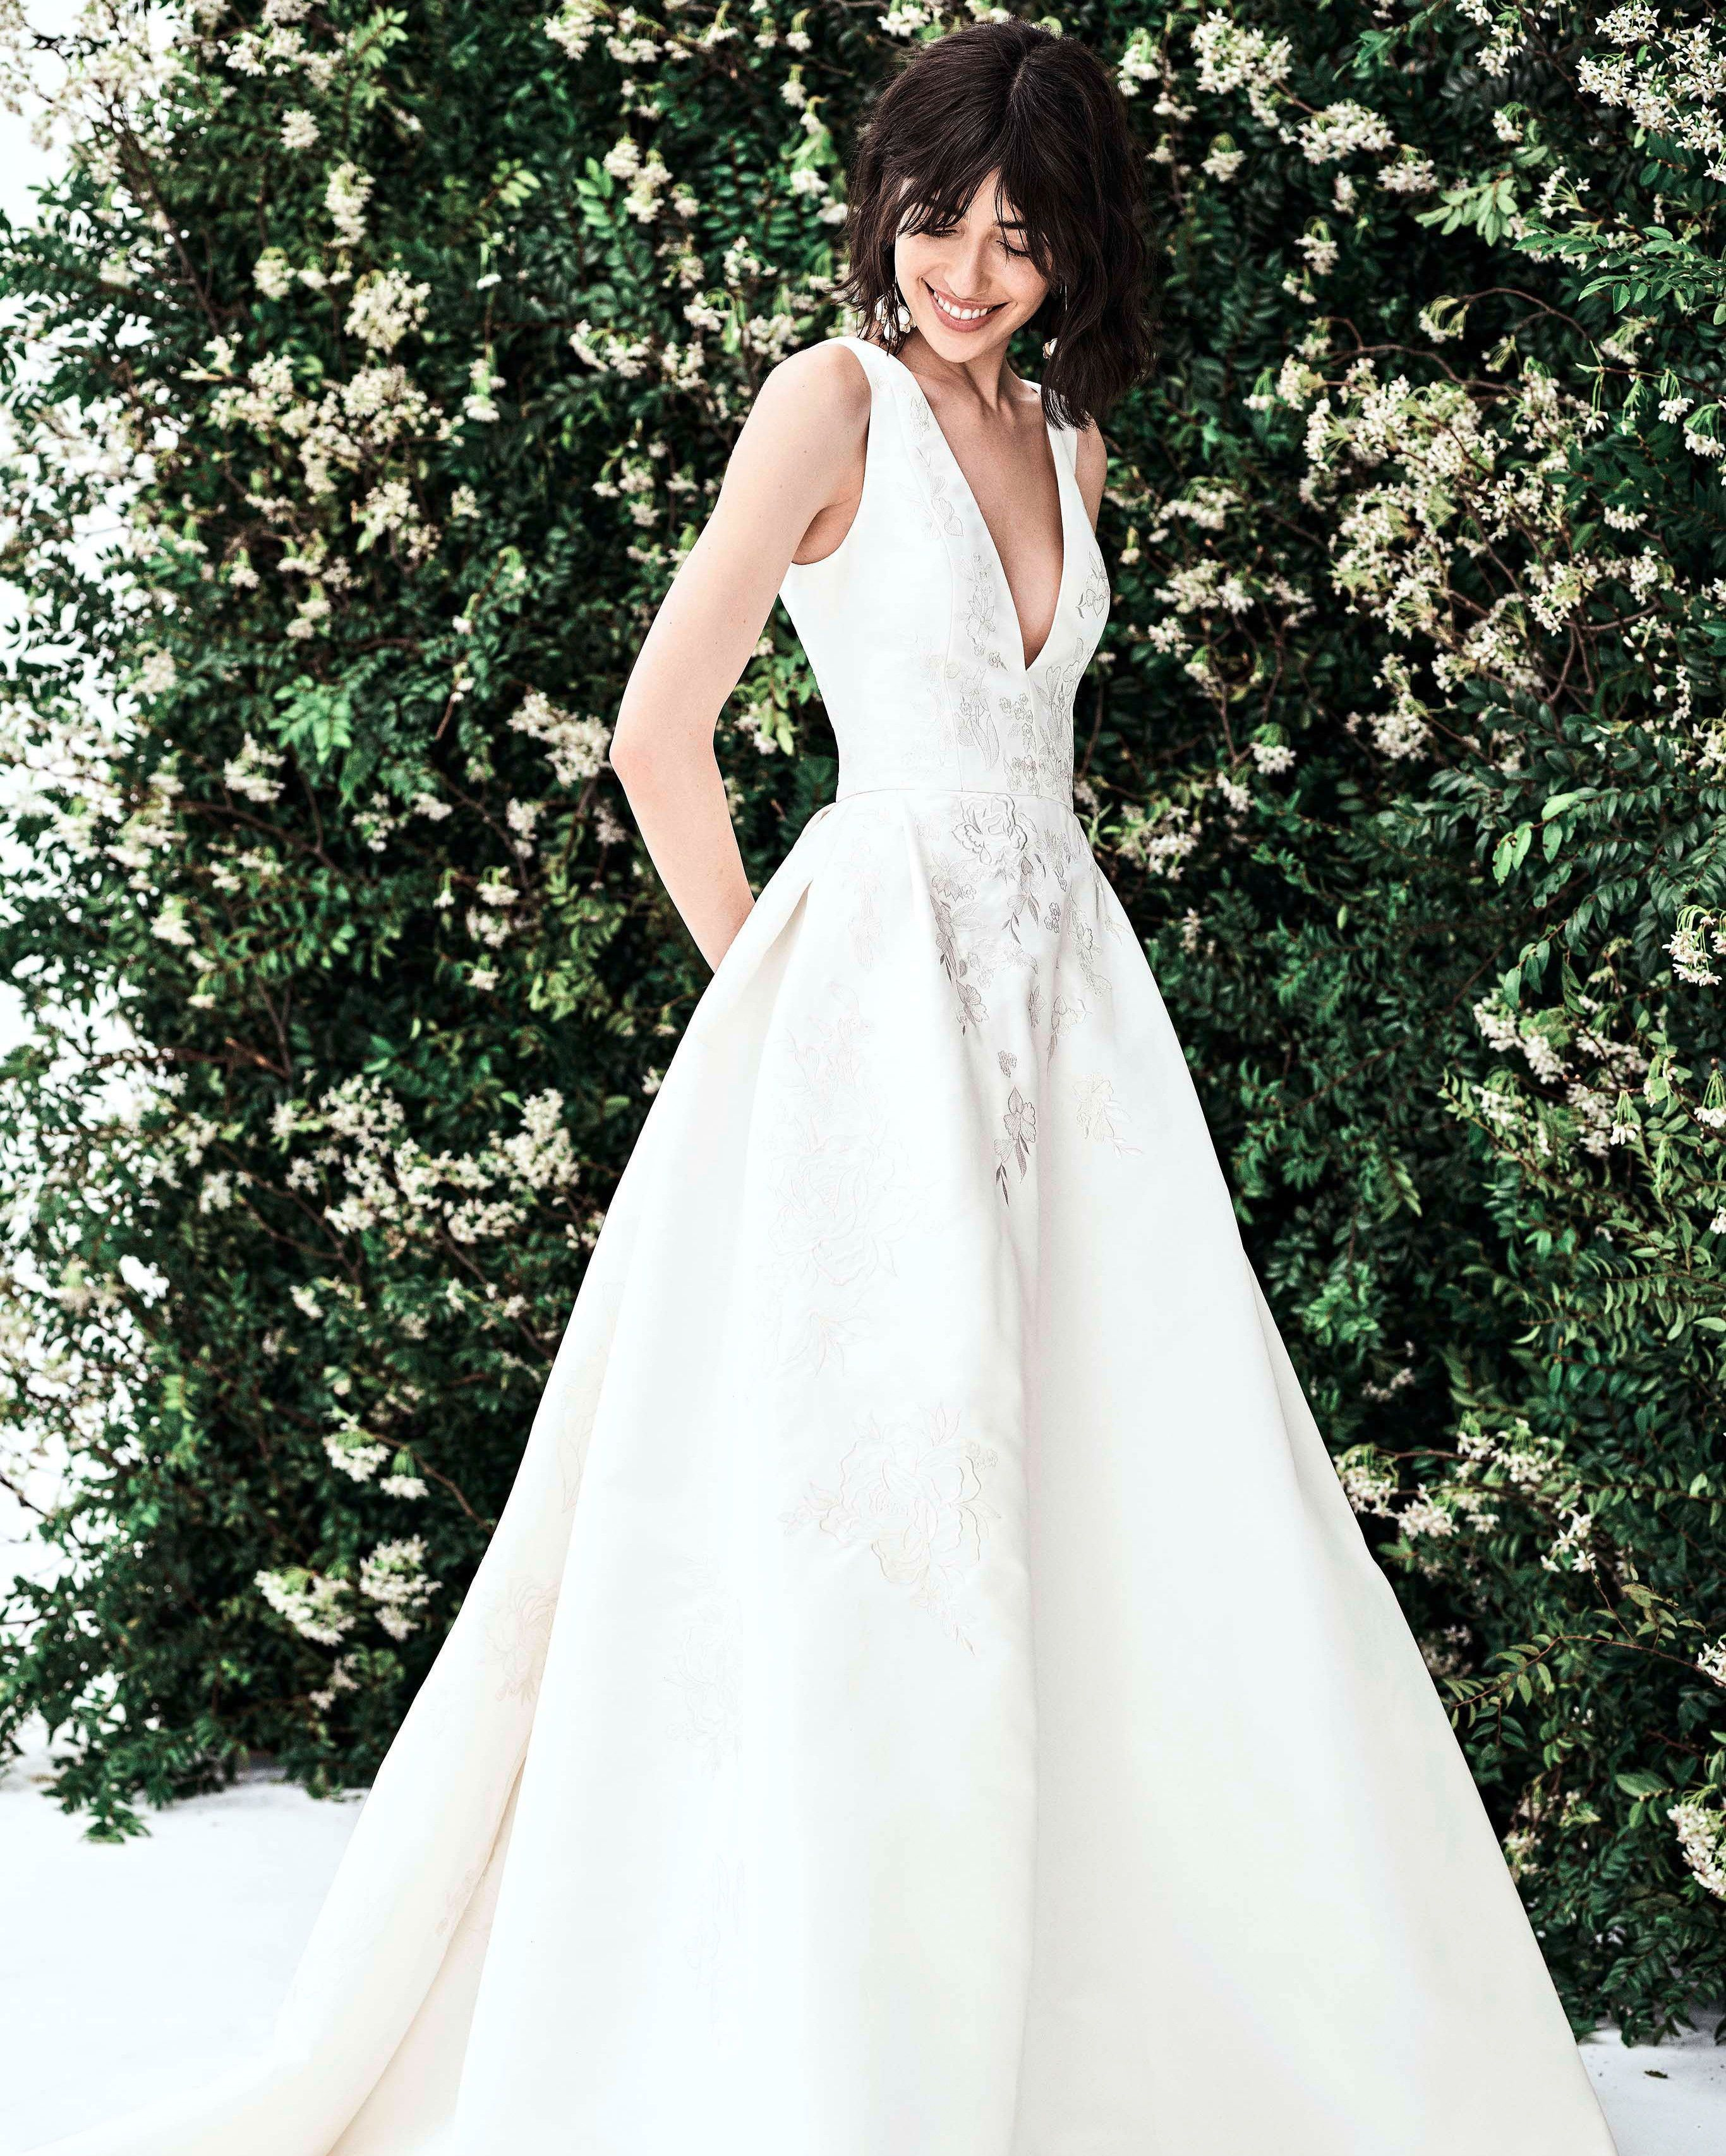 Carolina Herrera Spring 2020 Wedding Dress Collection Carolina Herrera Bridal Carolina Herrera Wedding Dress Designer Wedding Dresses